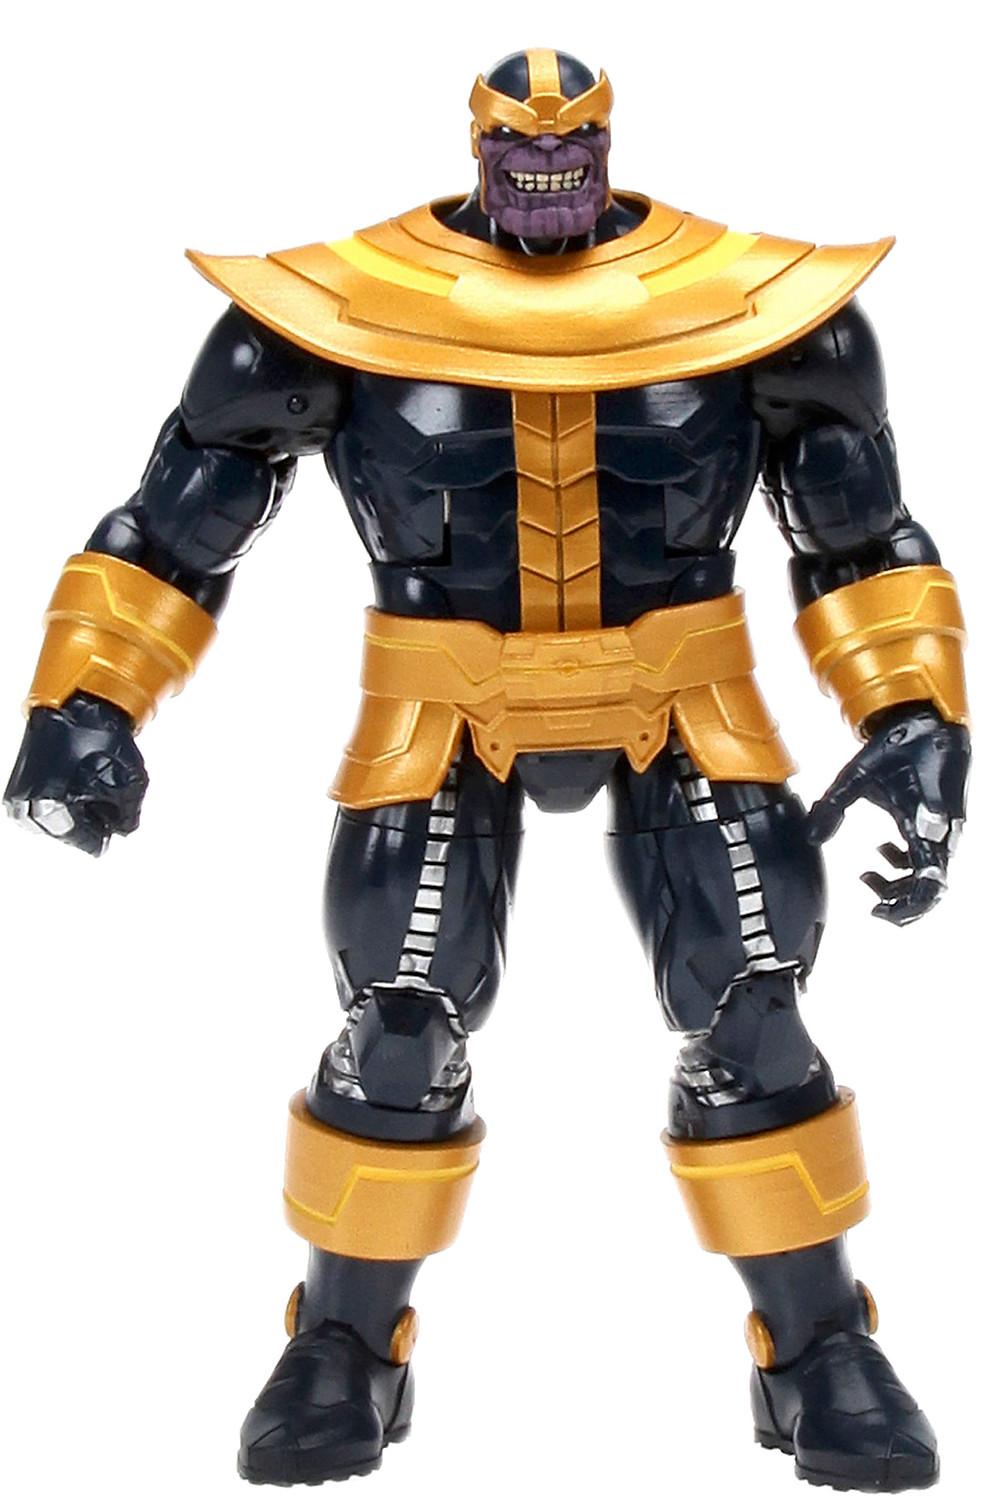 AvengersWave2-Thanos-Build-a-Figure.jpg